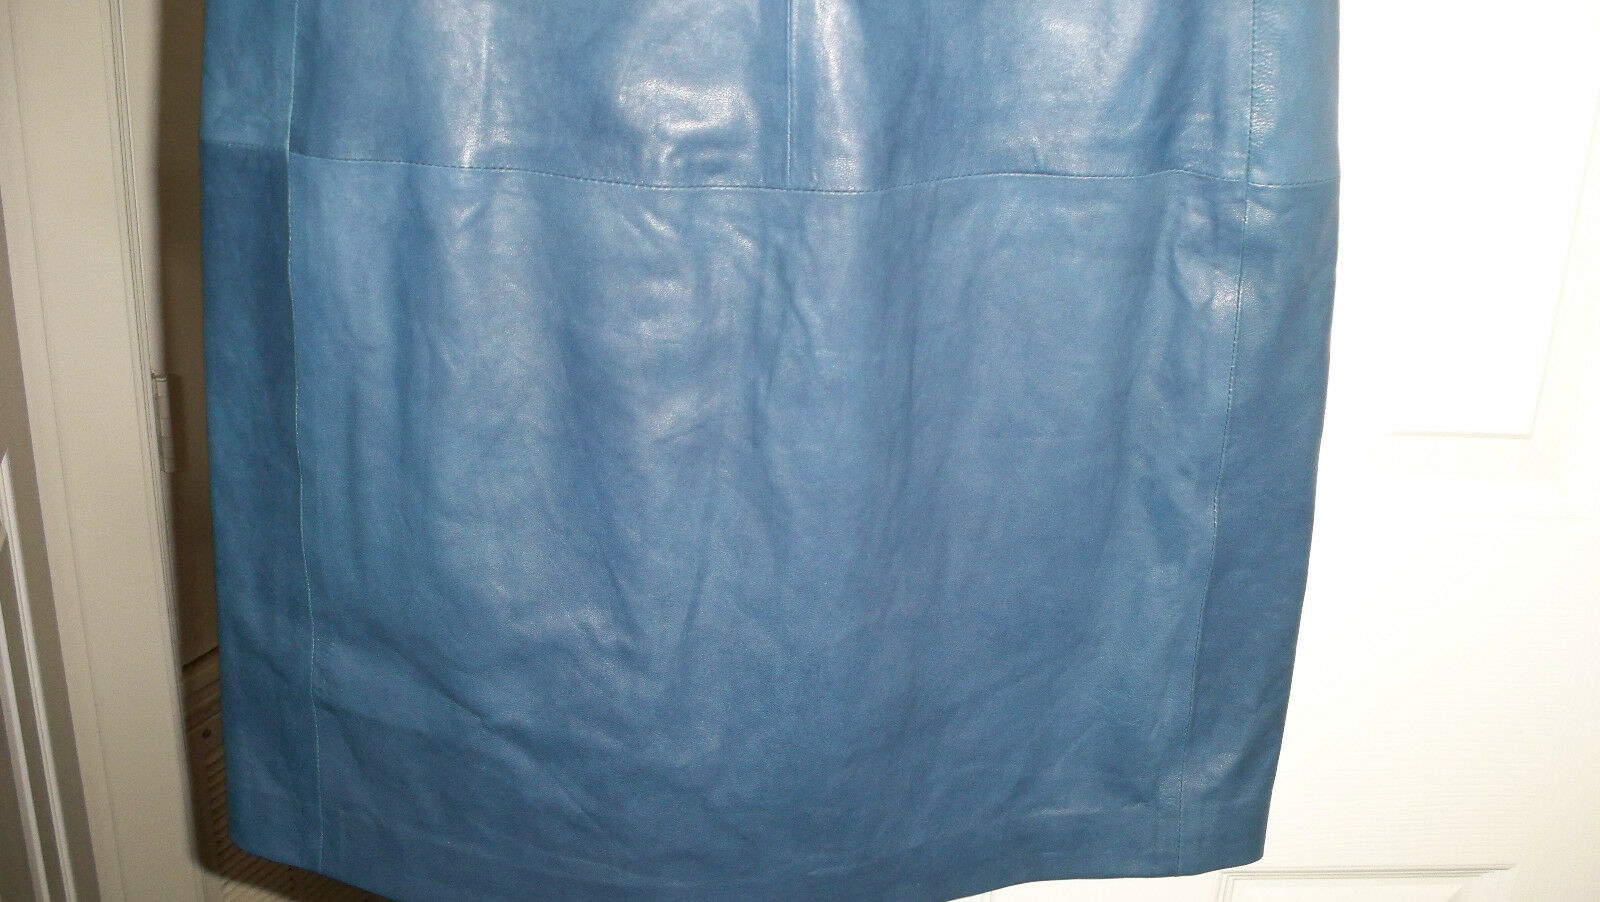 900 Vince Lambskin lightweight Leather Dress bluee 2 6 6 6 8 Absolutely GORGEOUS   85beb9